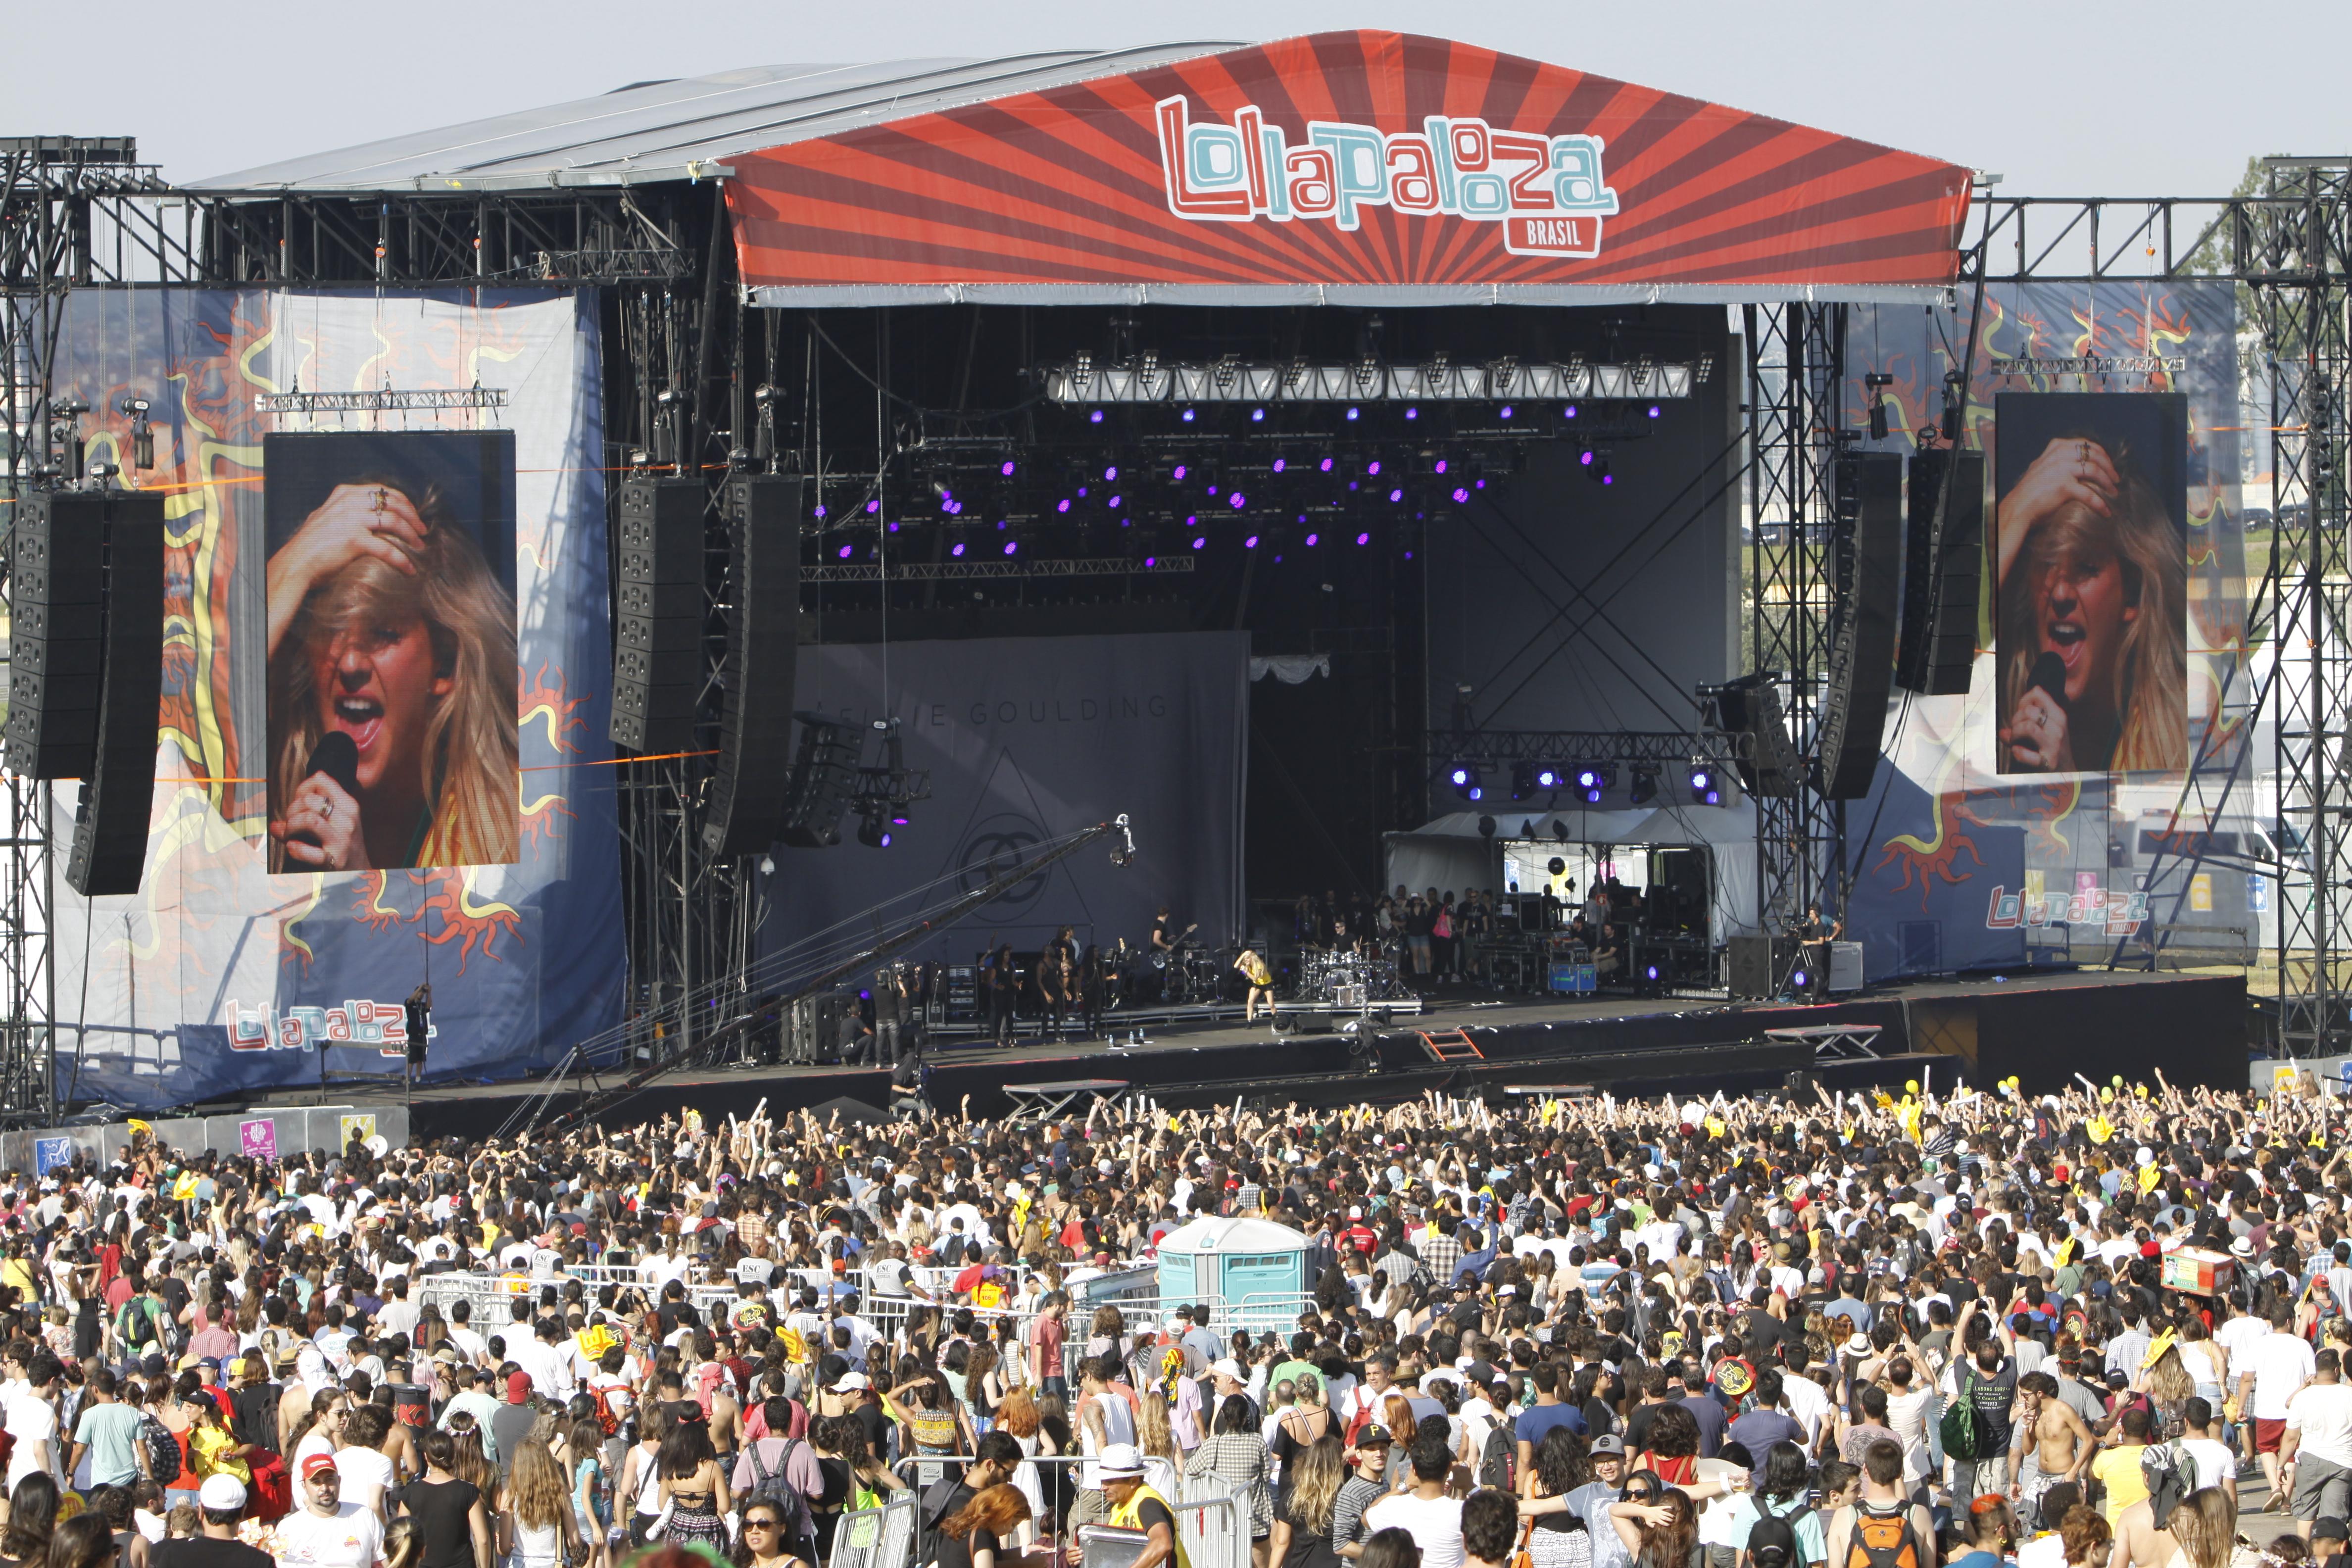 Em 2014, Lollapalooza estreou no Autódromo de Interlagos. Foto: Marcelo Iha/ SPTuris.